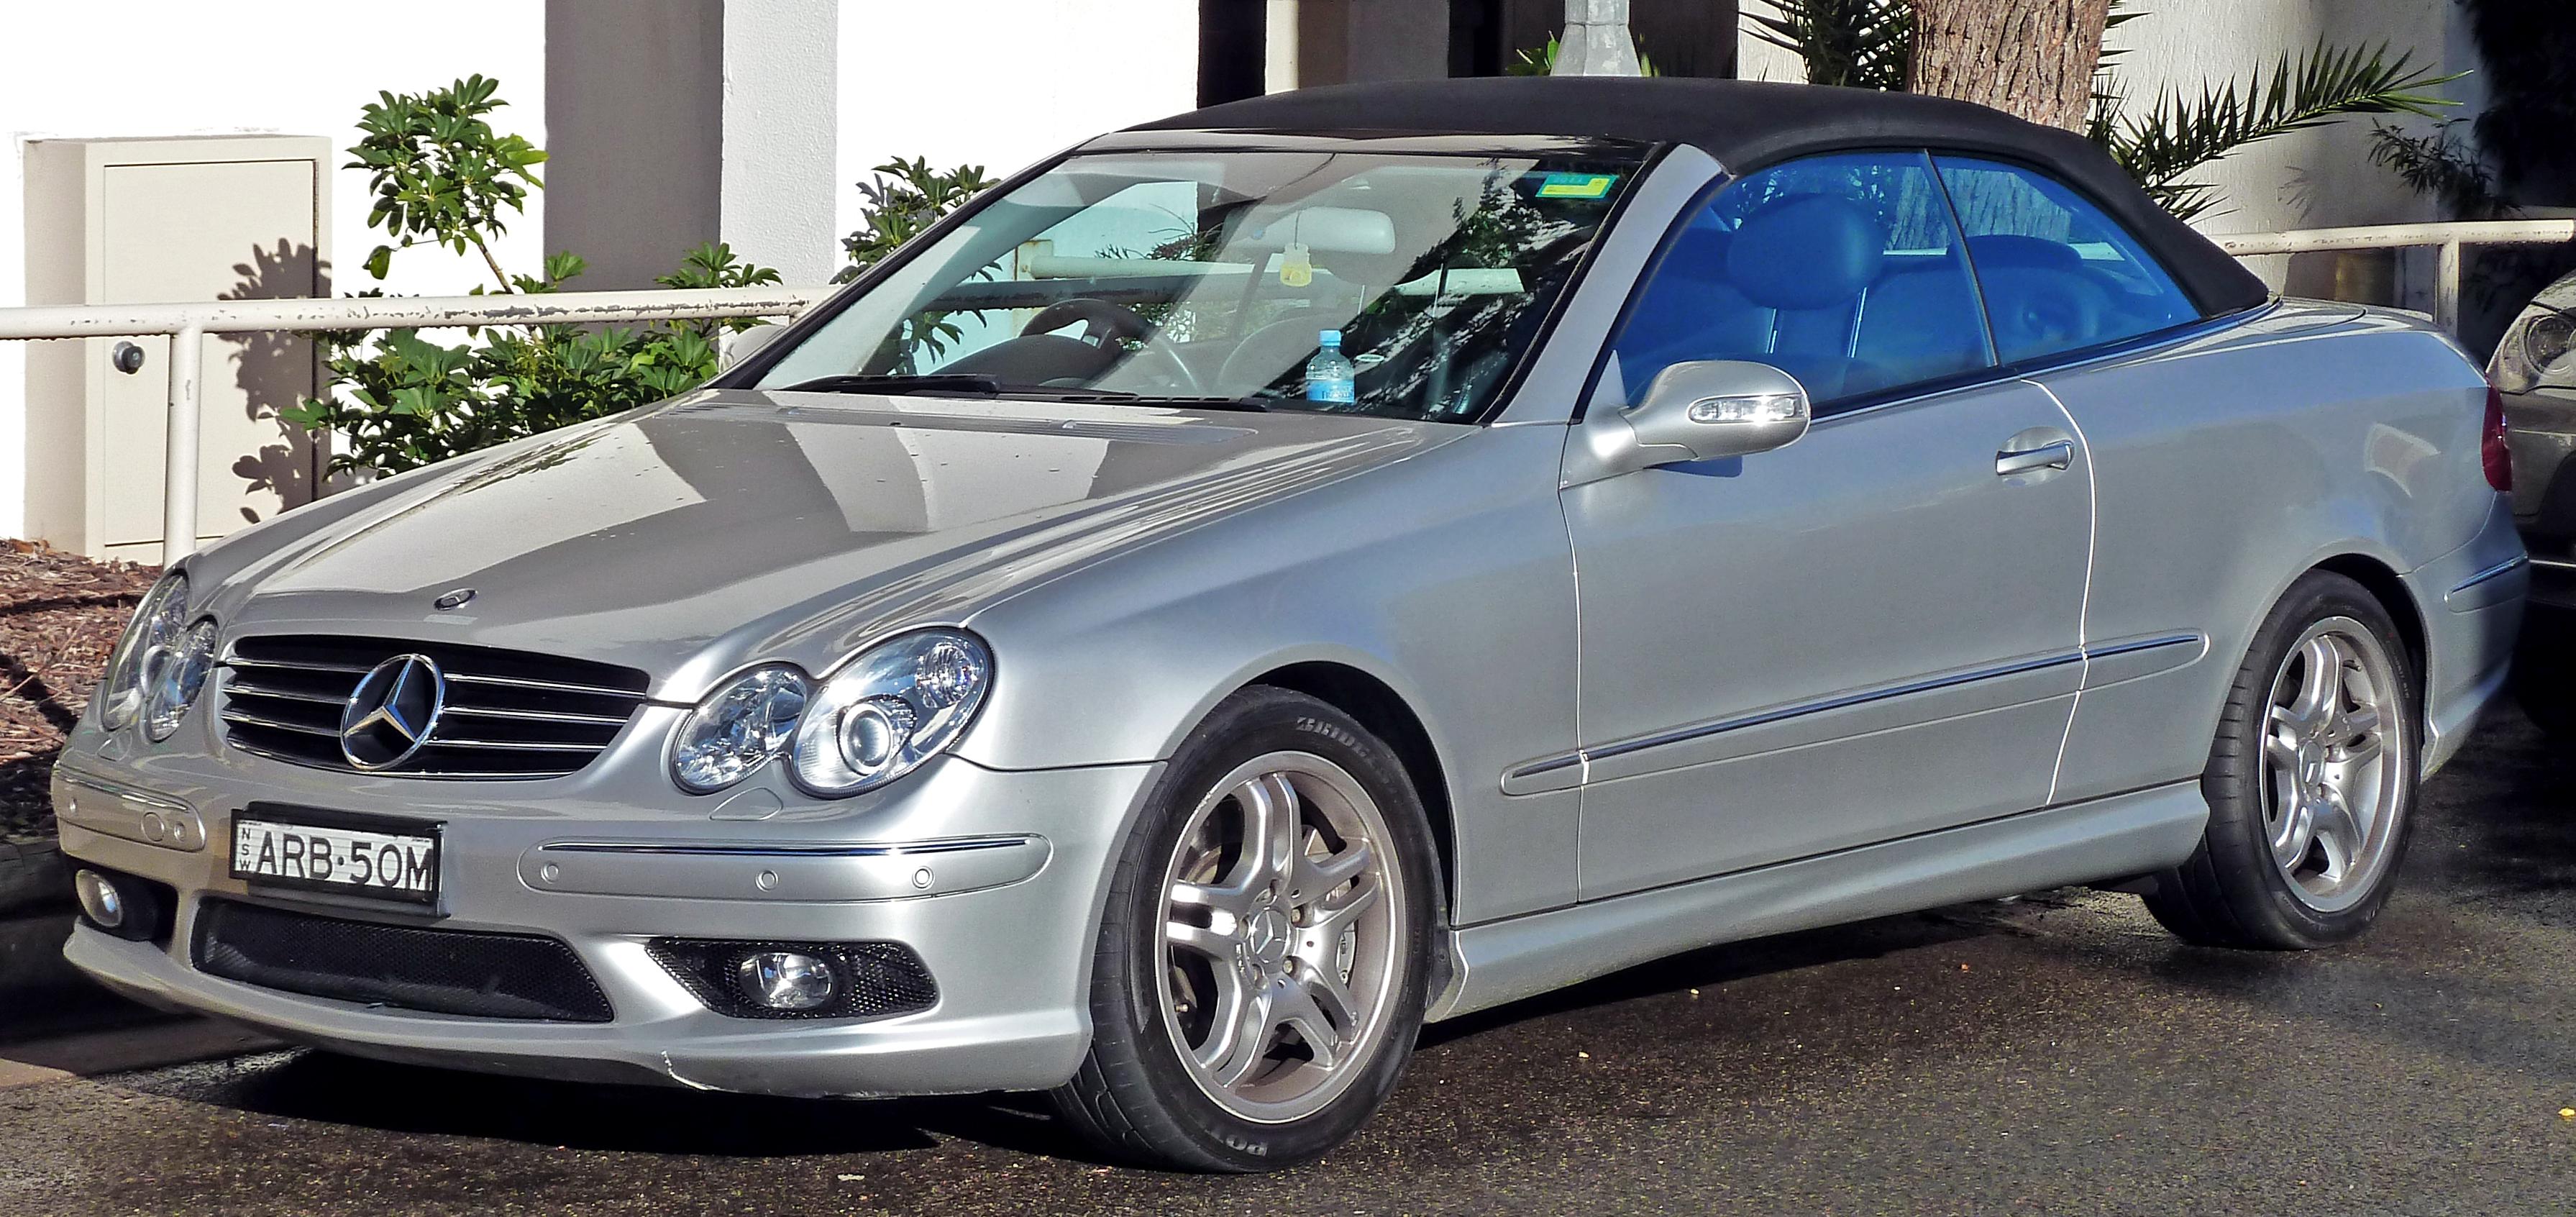 File 2004 Mercedes Benz Clk 55 Amg A 209 Convertible 2010